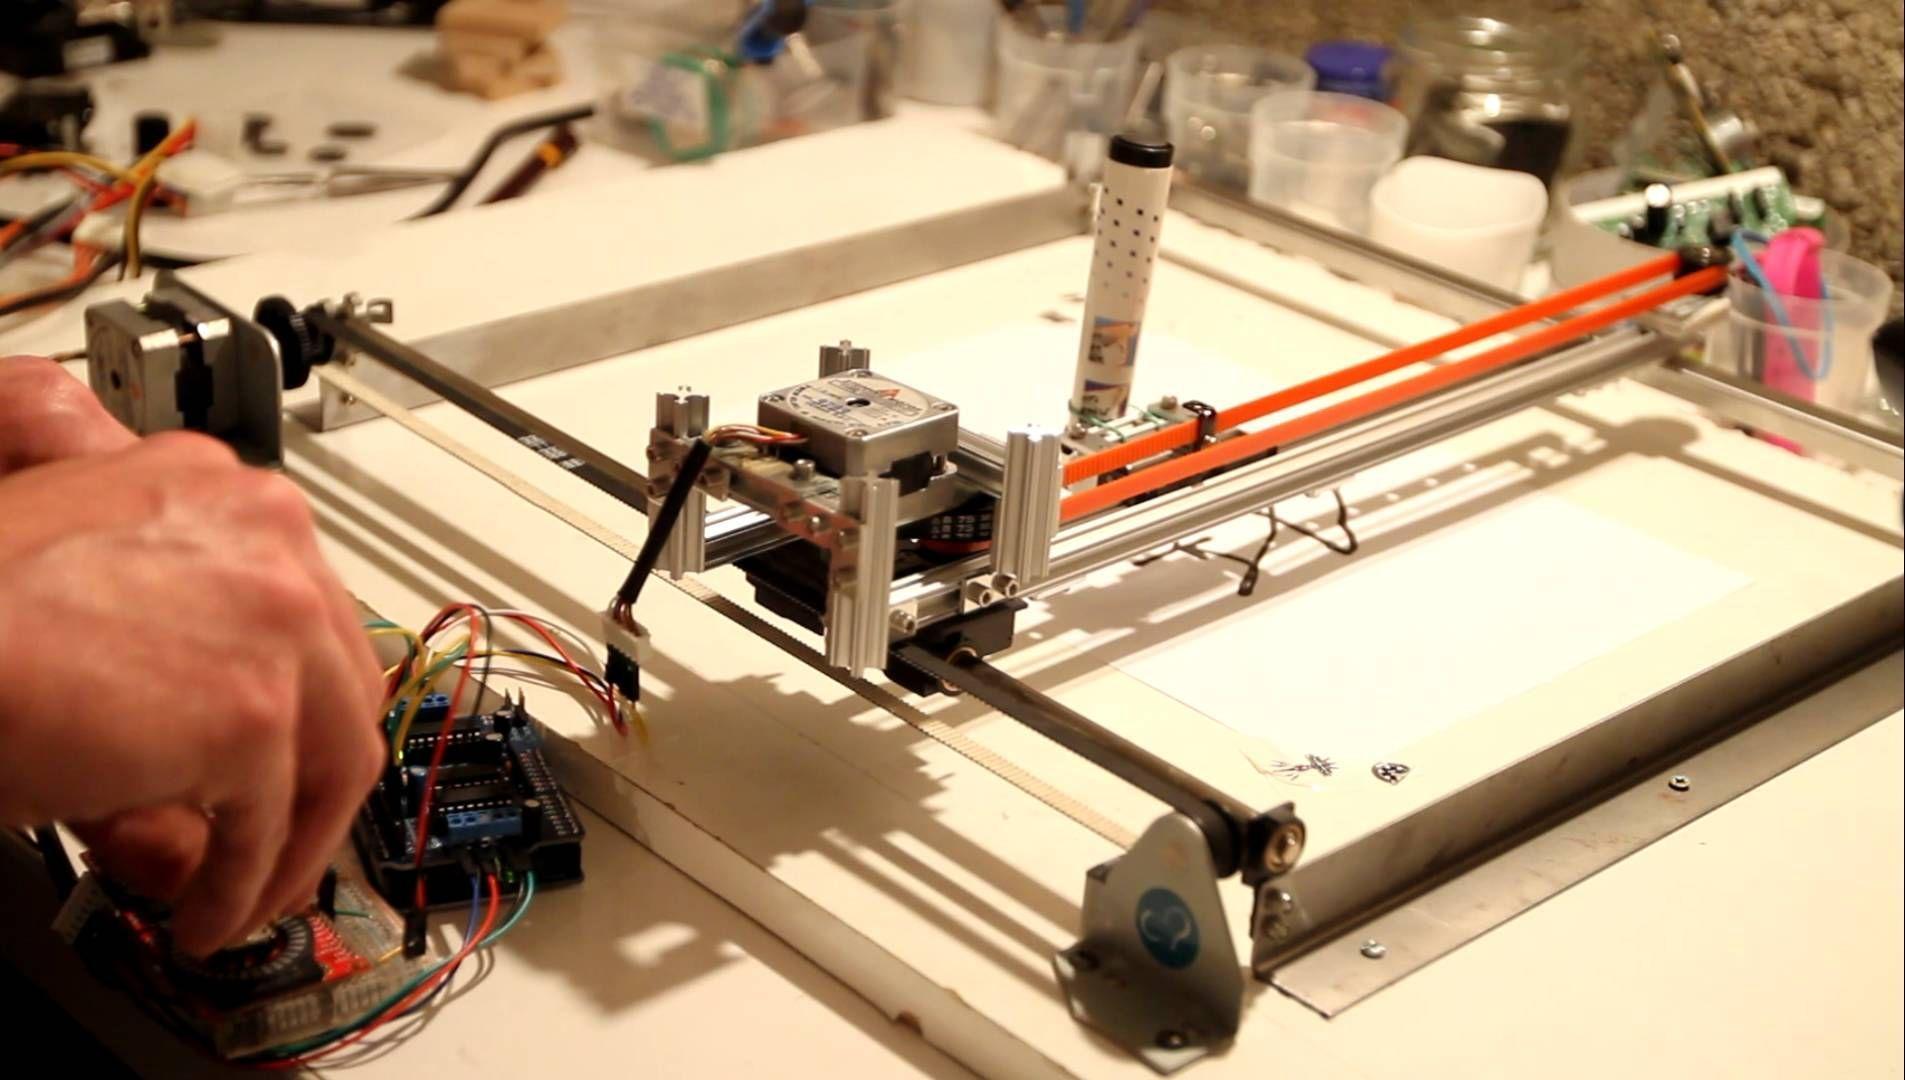 Building a xy plotter from an arduino adafruit motor